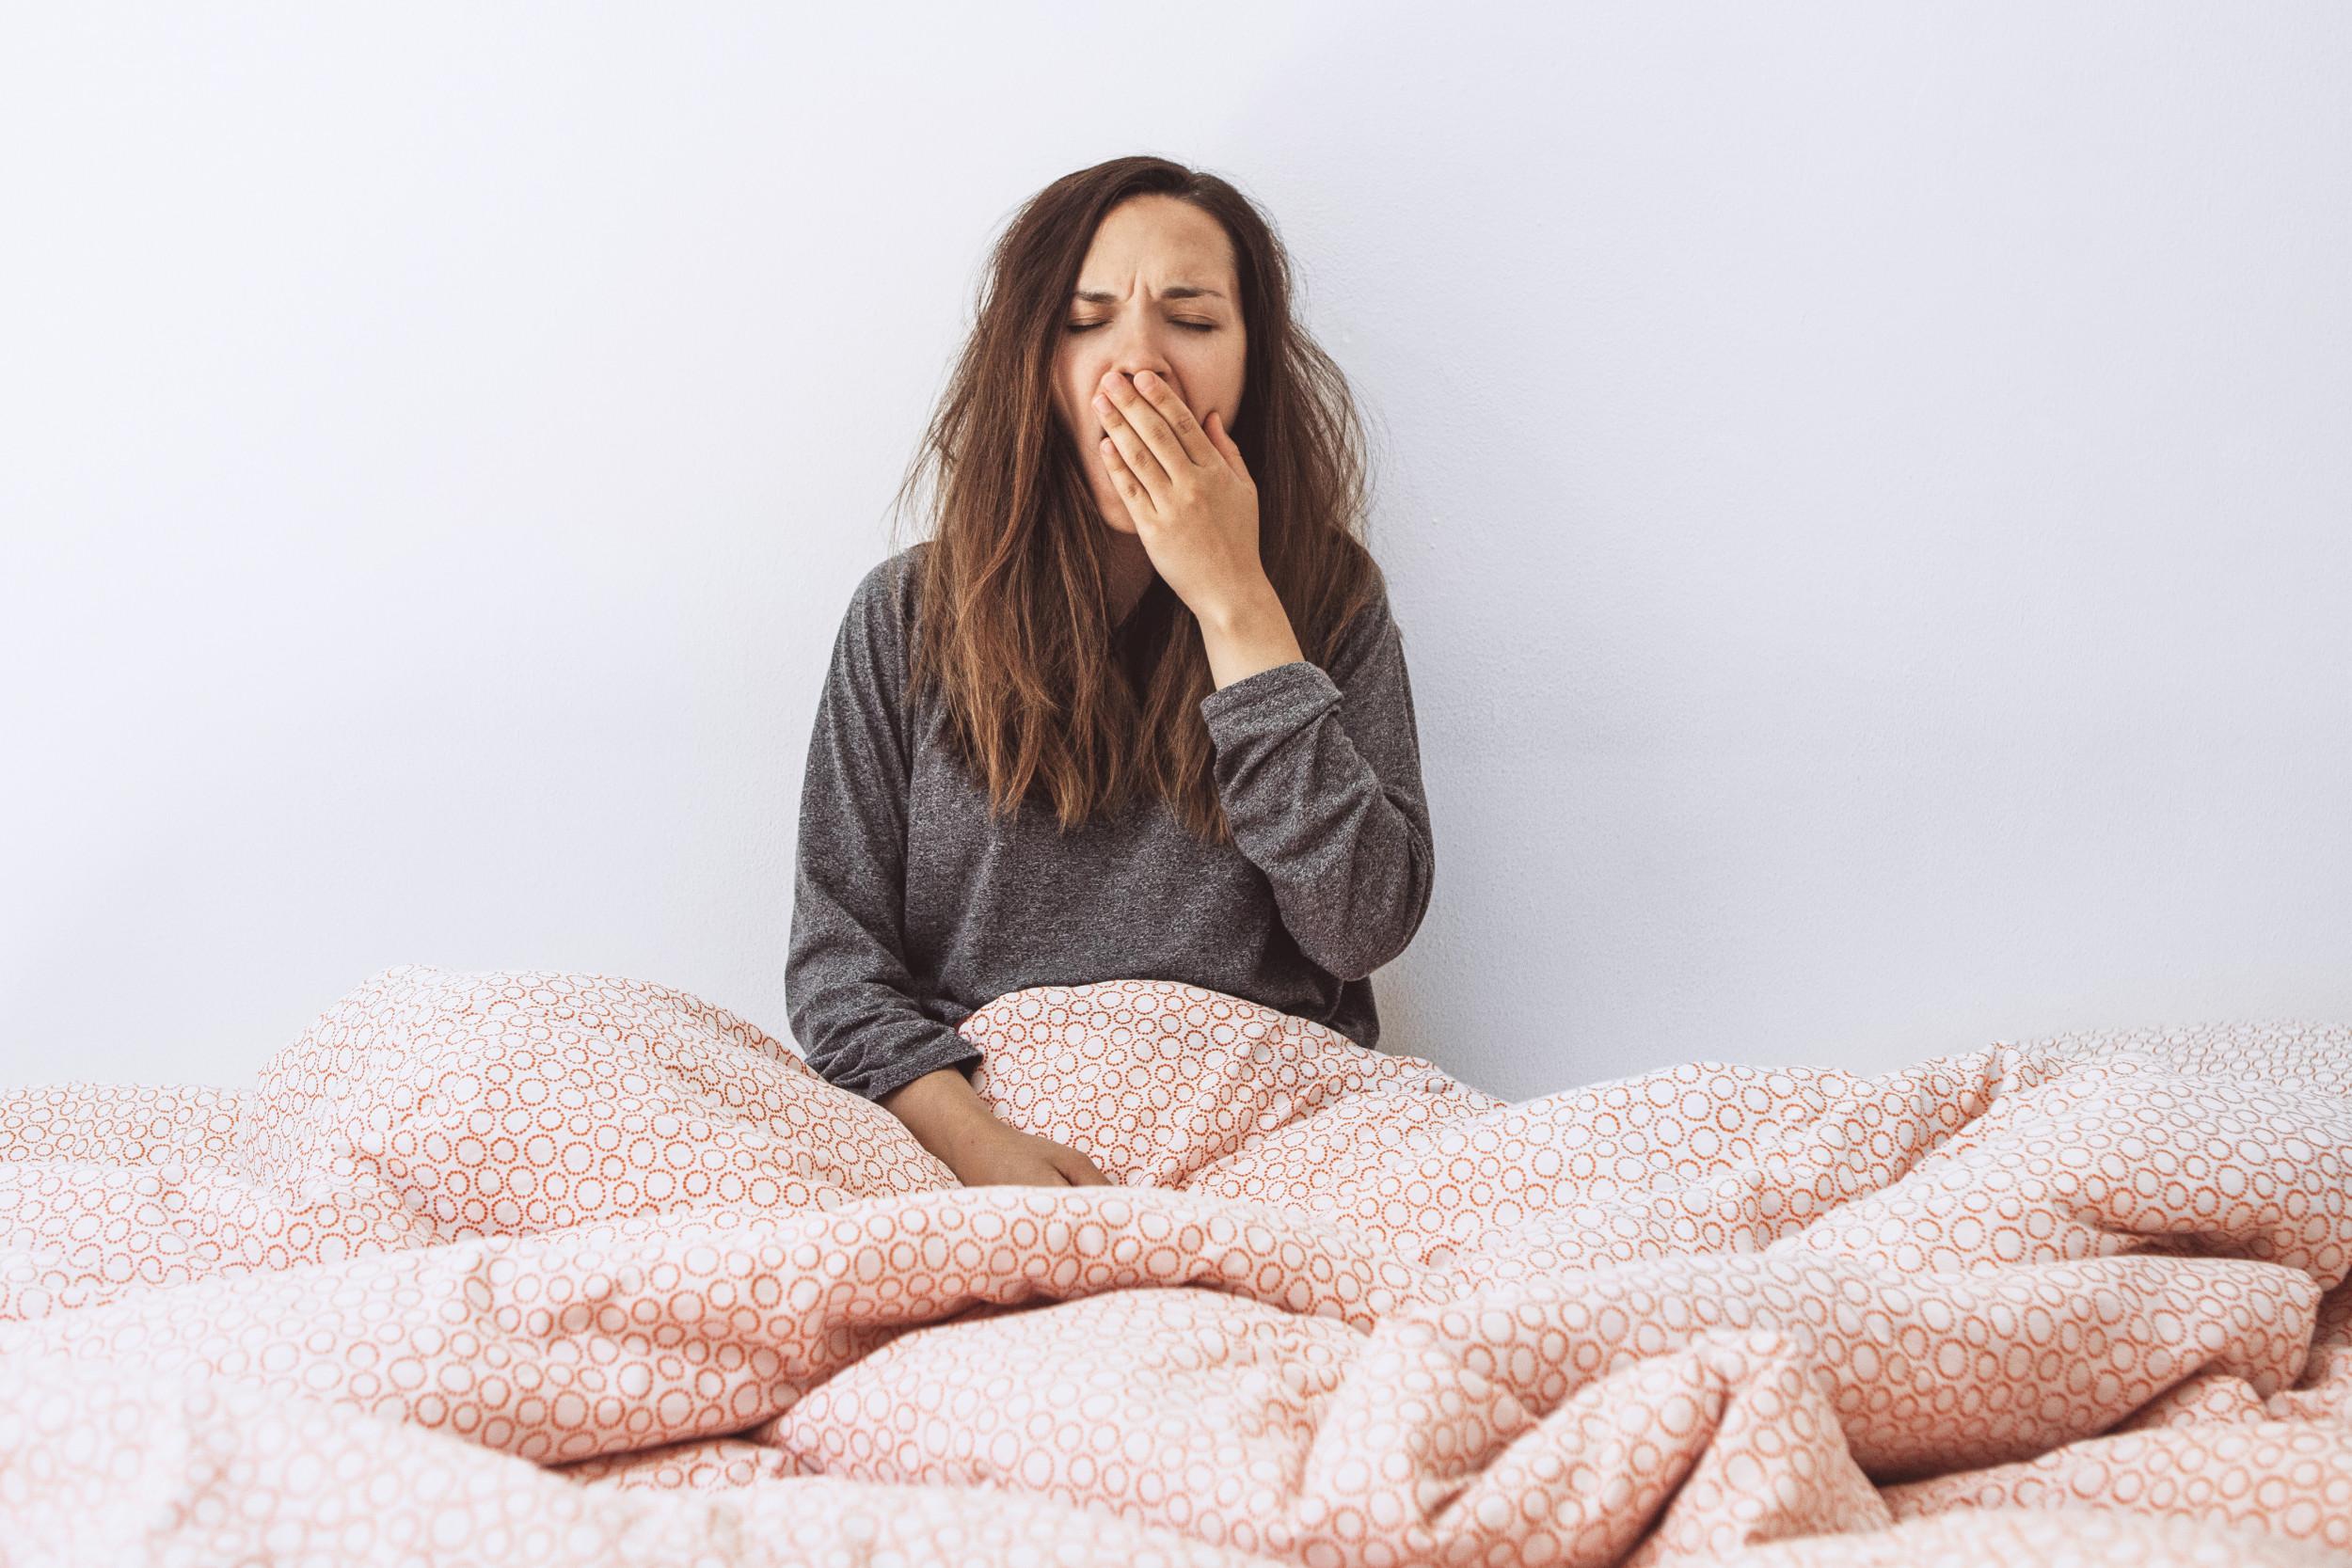 """I'm a sleep doctor. Here are 5 tips to sleep well"""